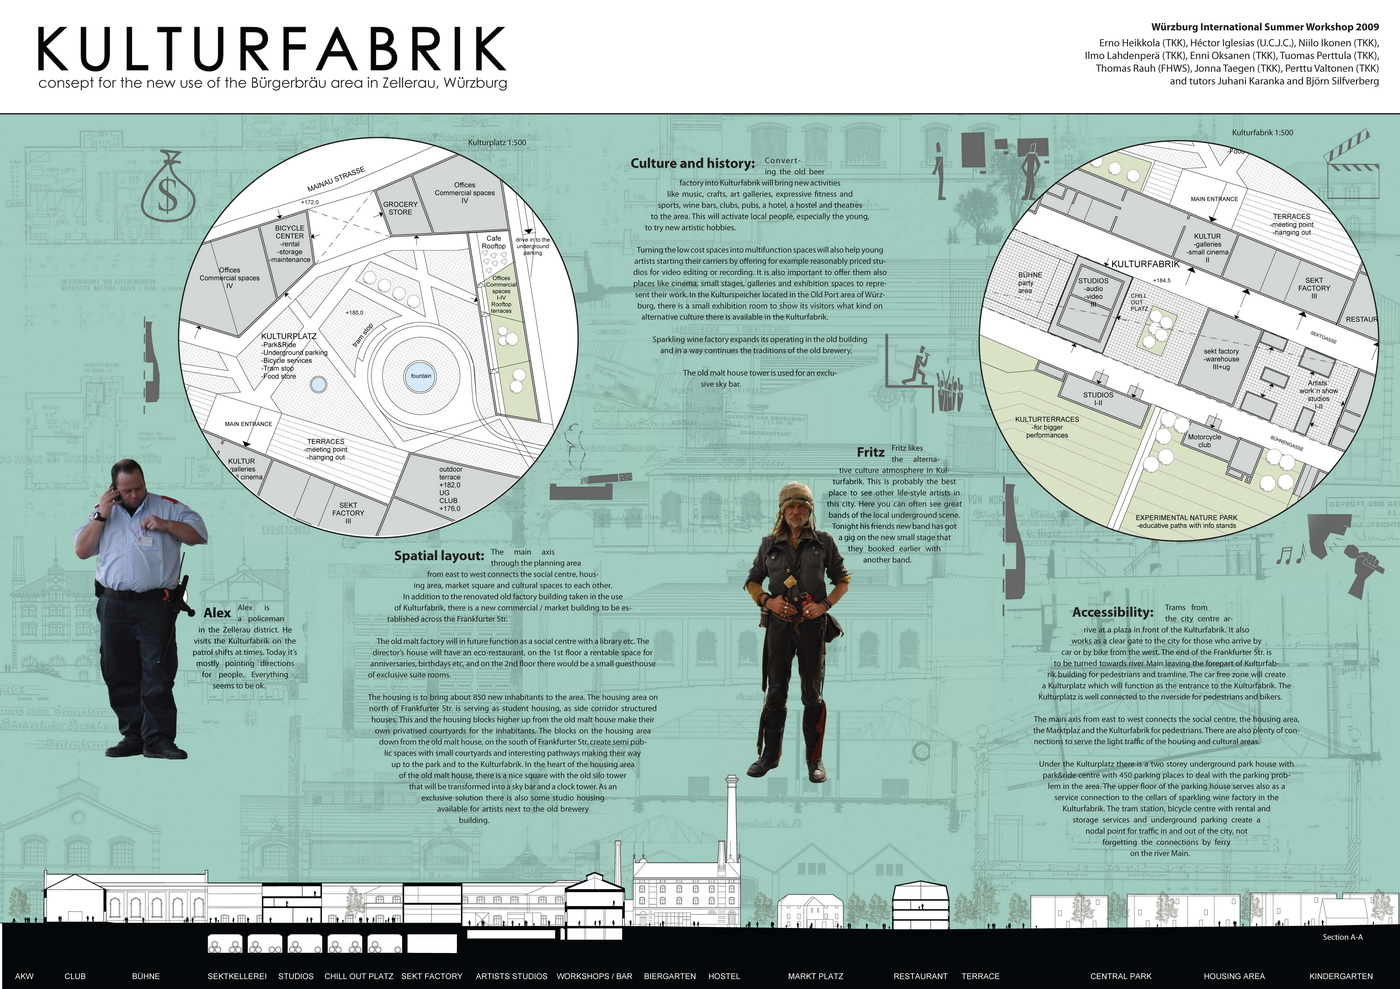 kulturfabrik_5